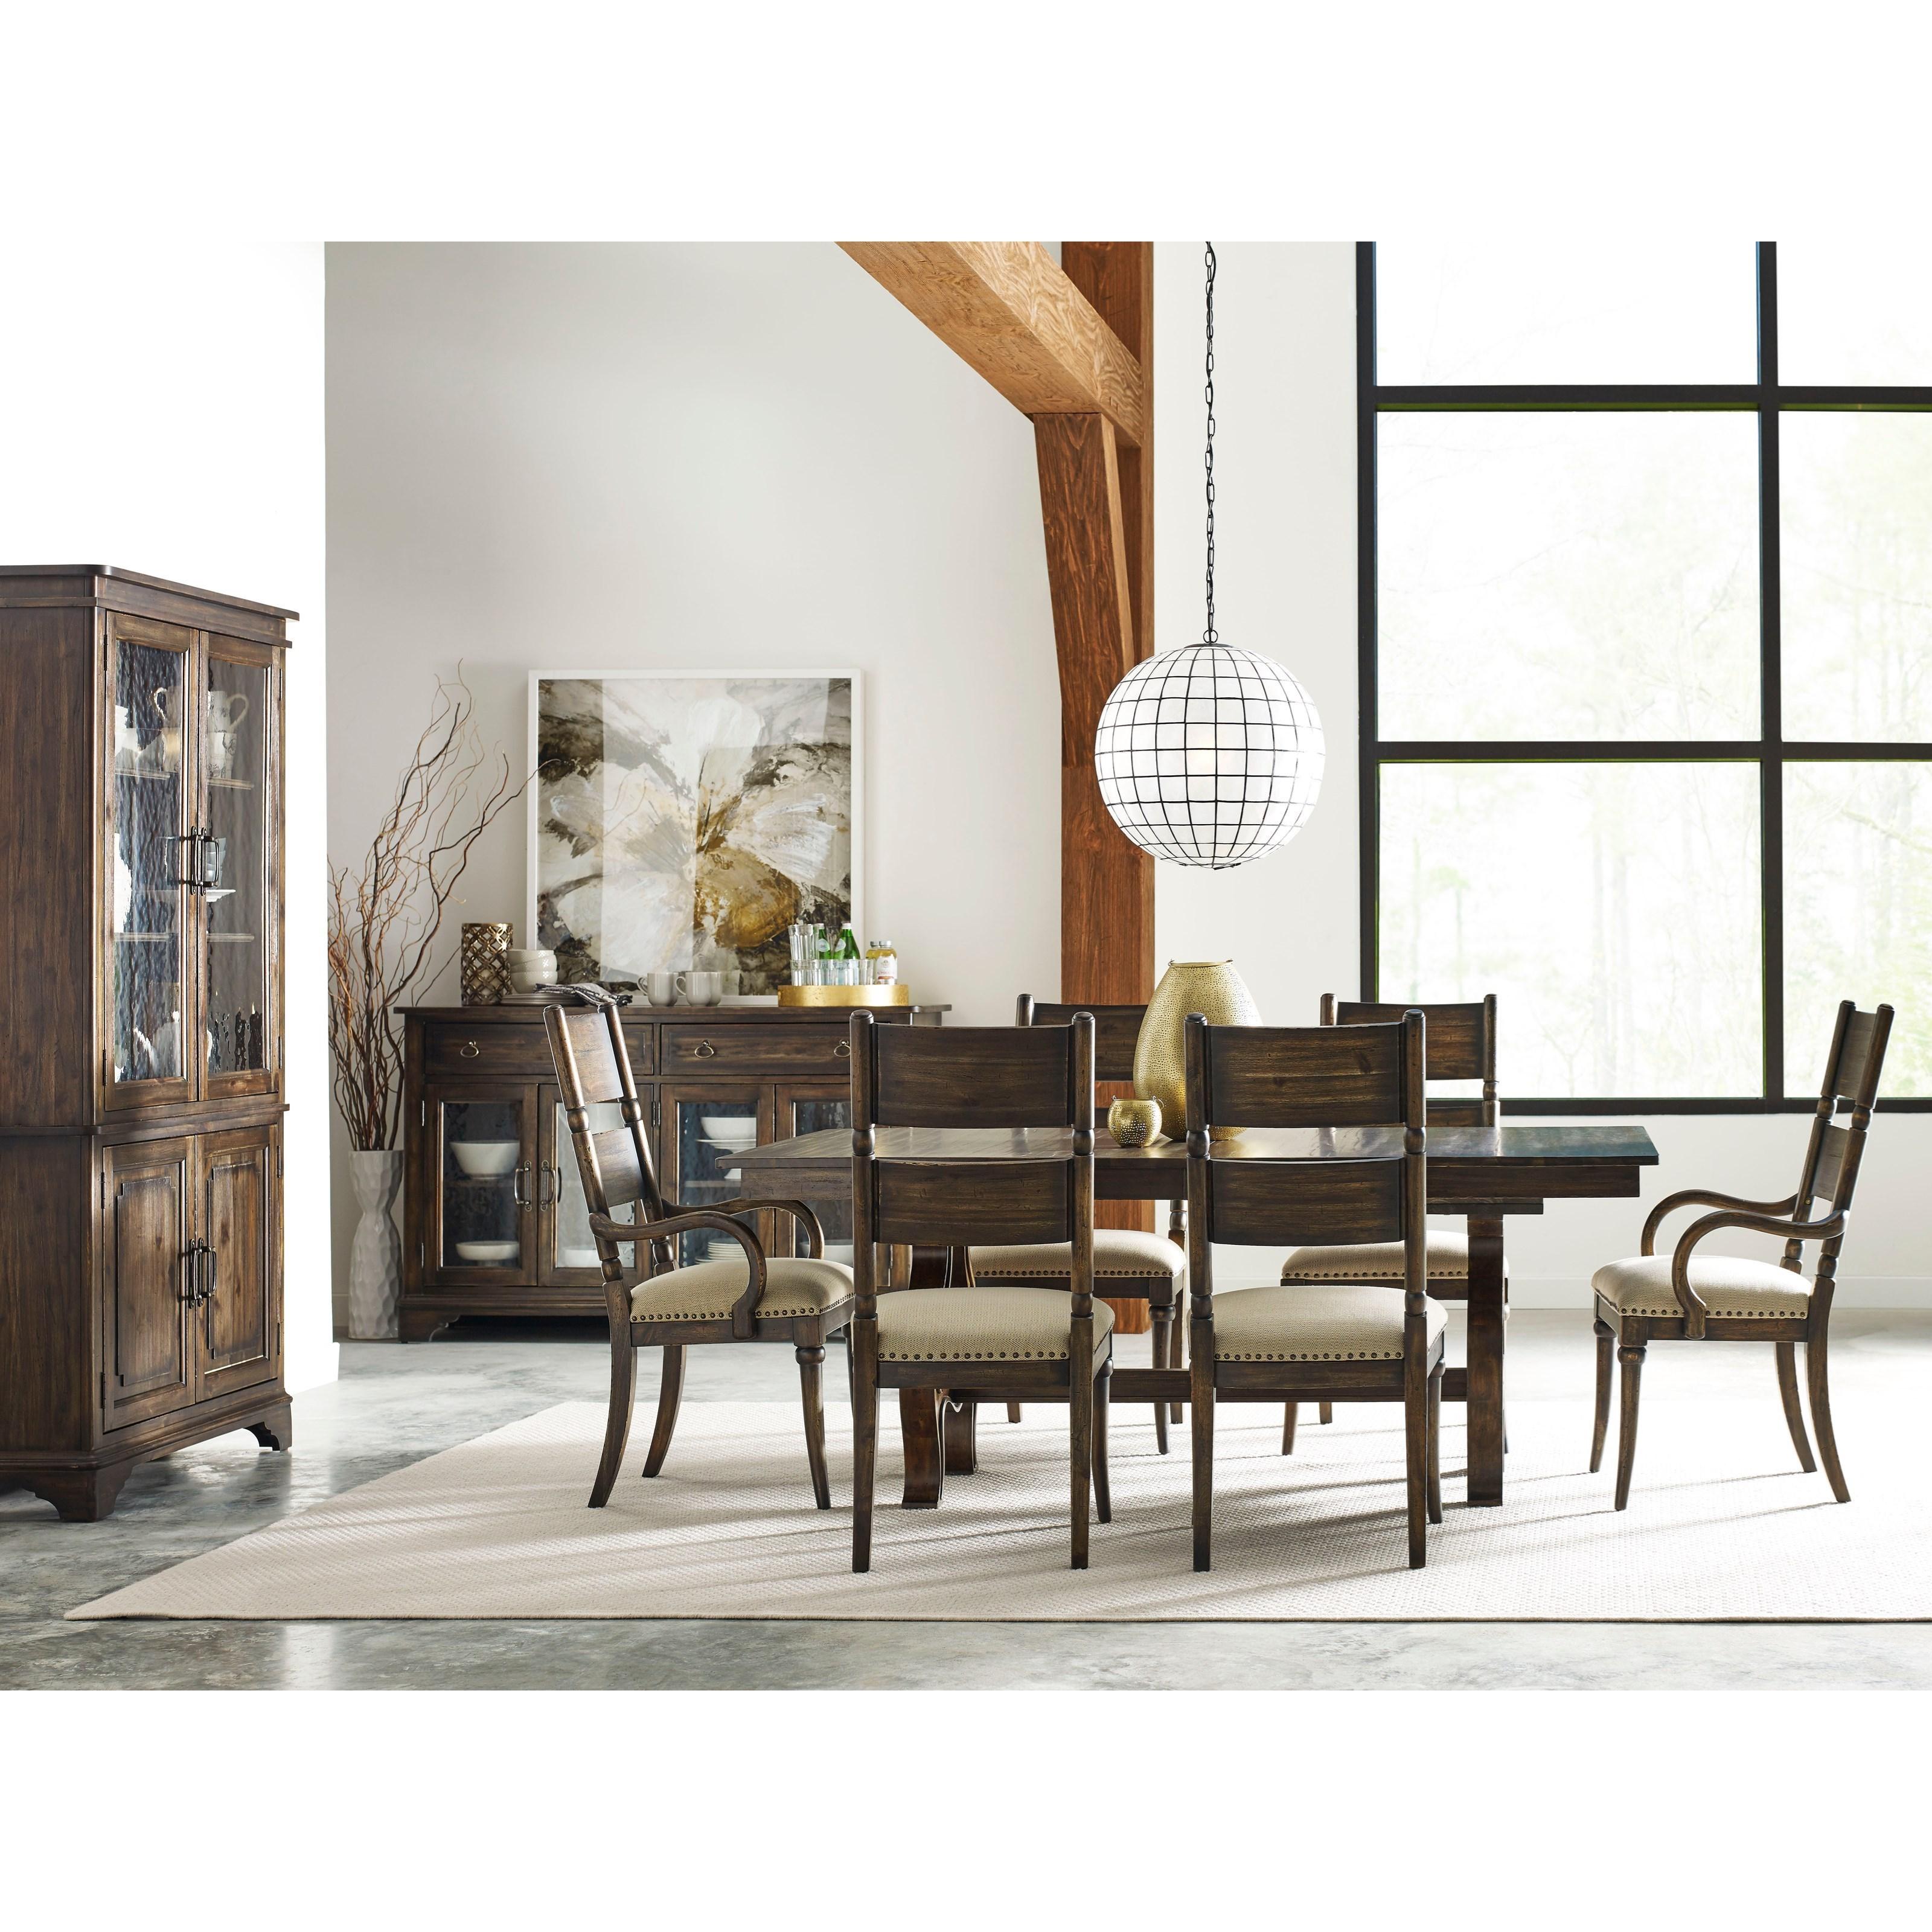 Kincaid Dining Room: Kincaid Furniture Wildfire Nine Piece Formal Dining Room